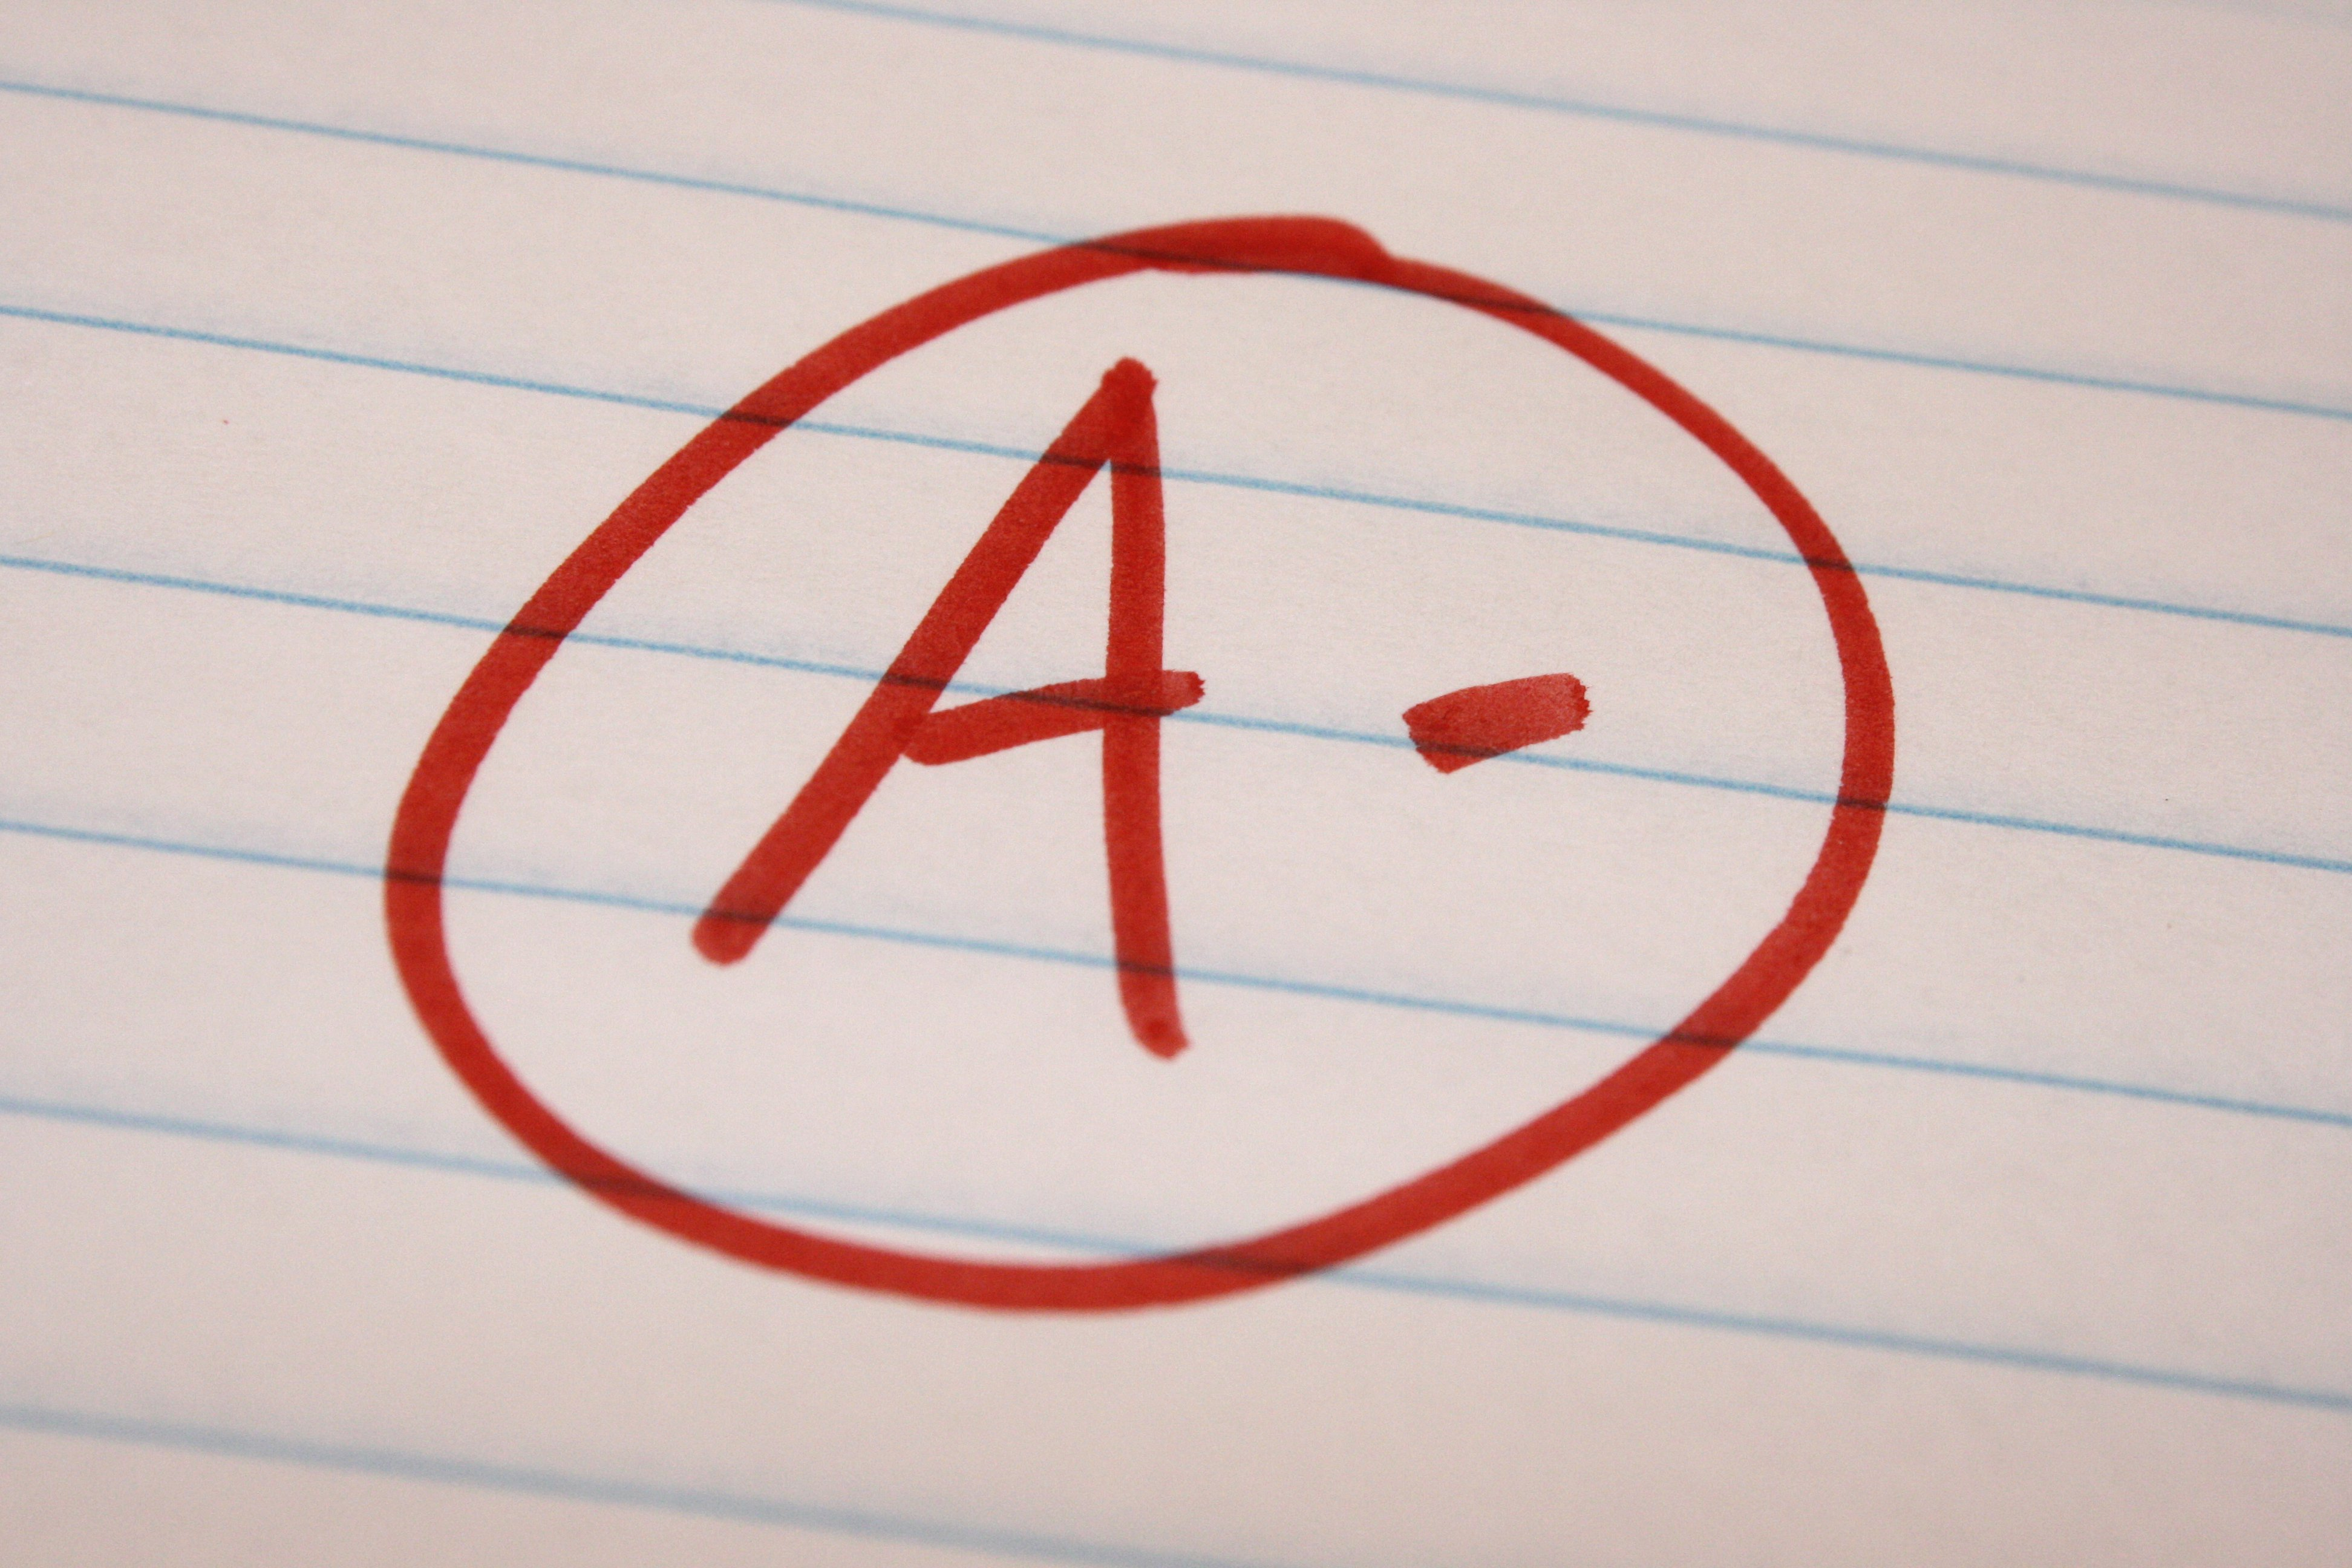 Grades clipart letter grade.